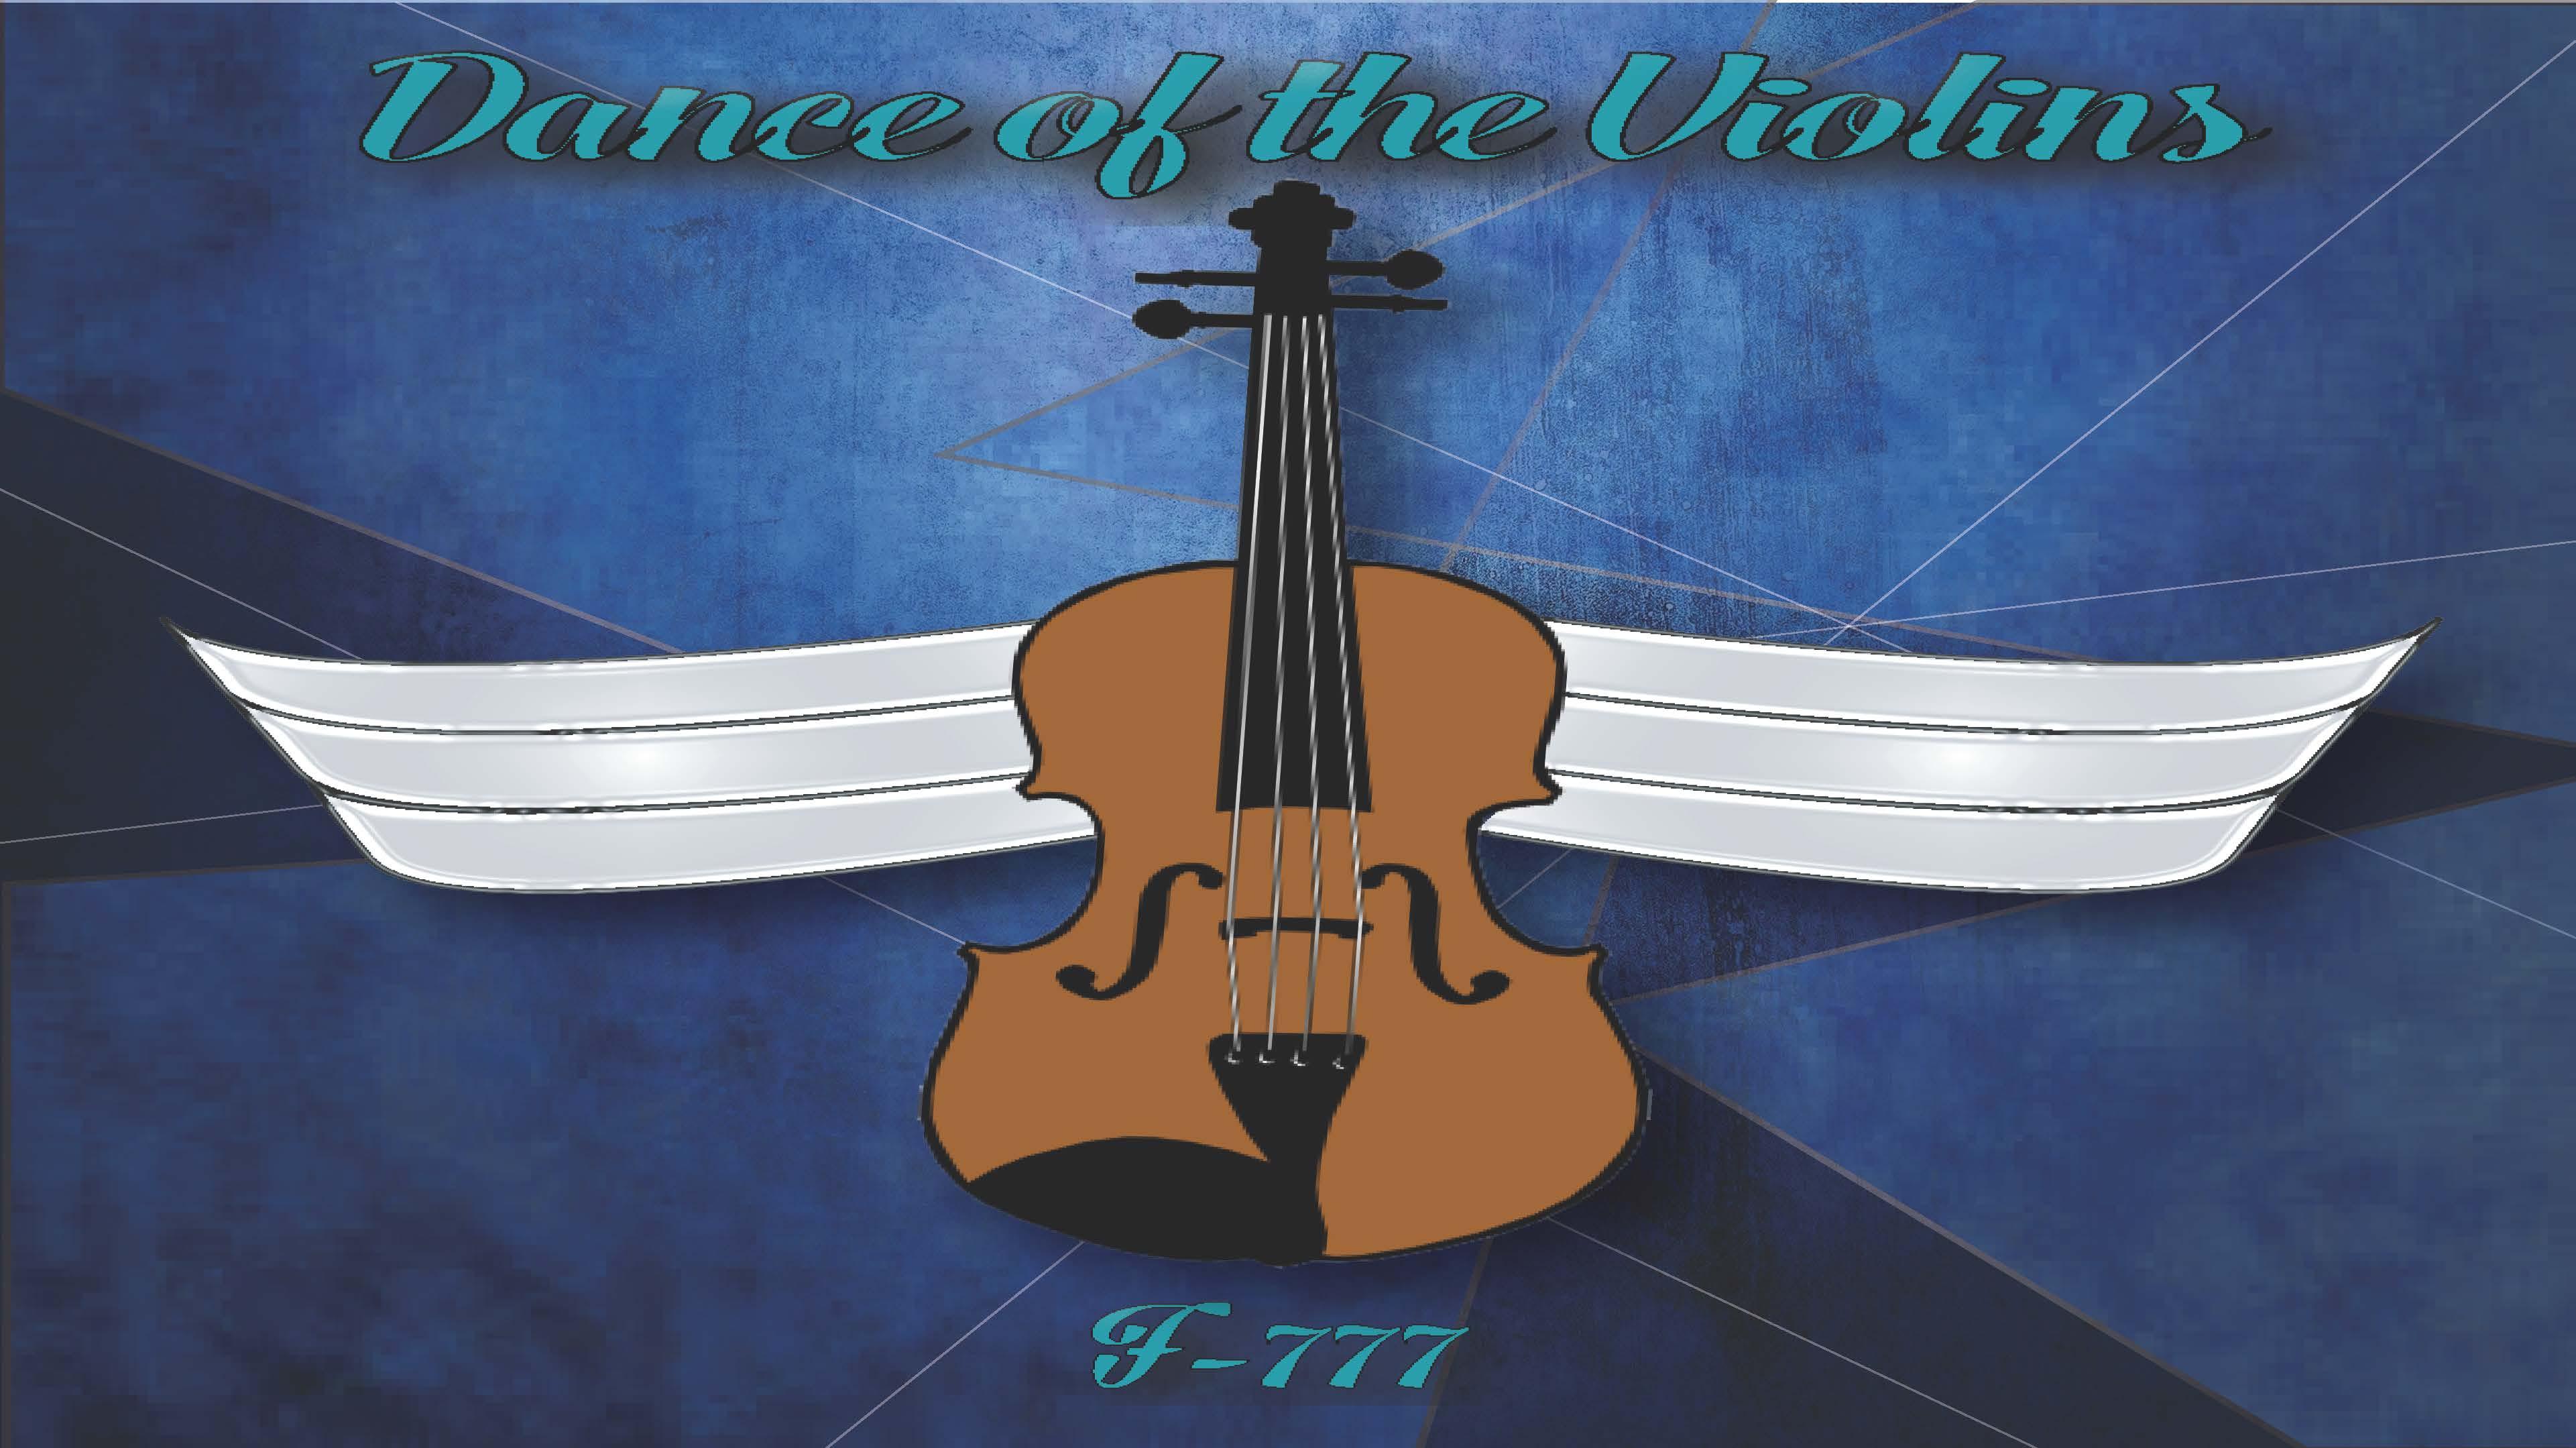 Dance of the Violins (Fan-made album art)